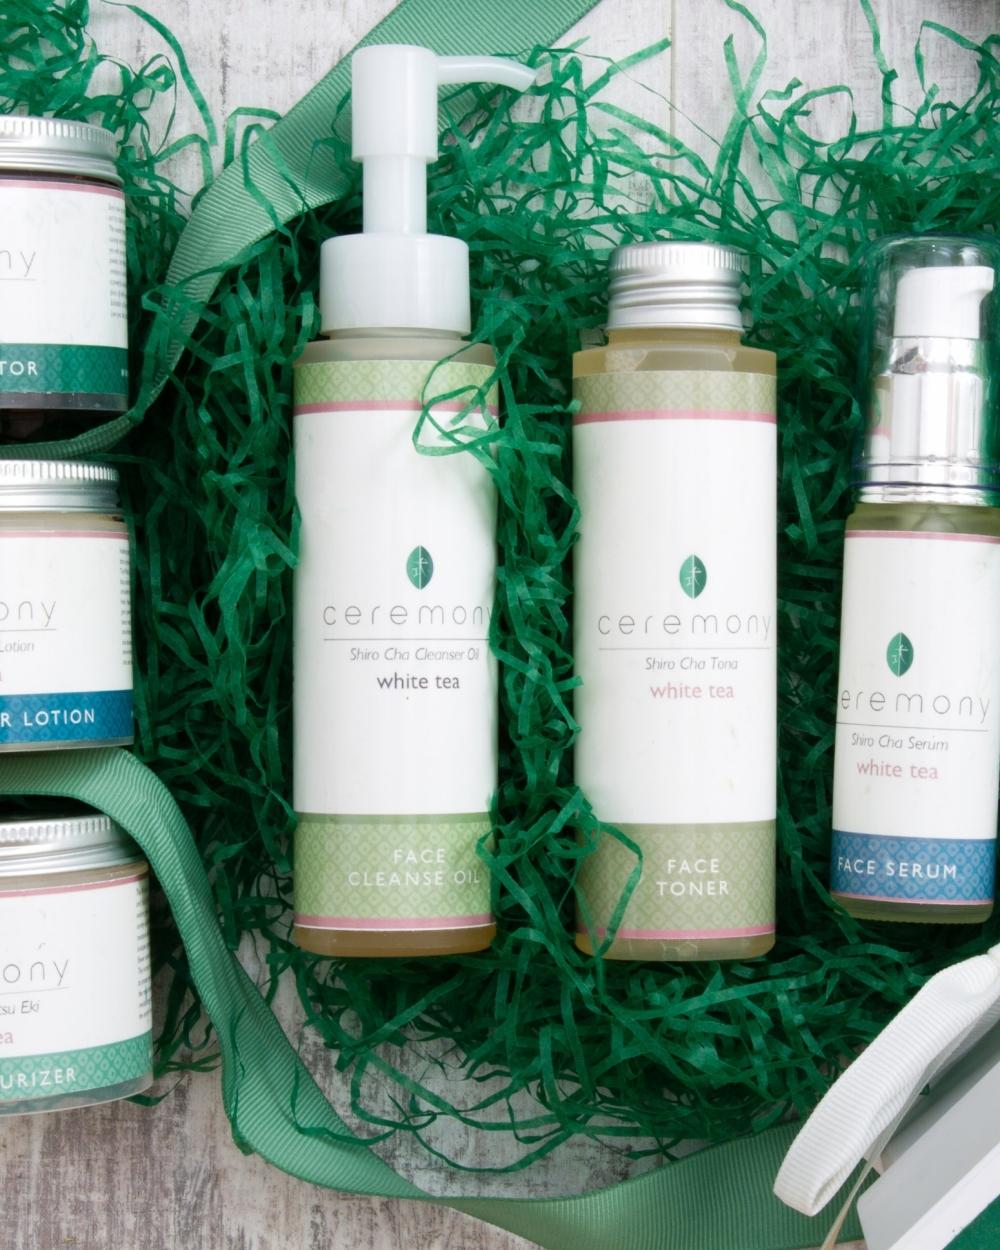 White Tea Luxury Gift Box Ceremony Skincare